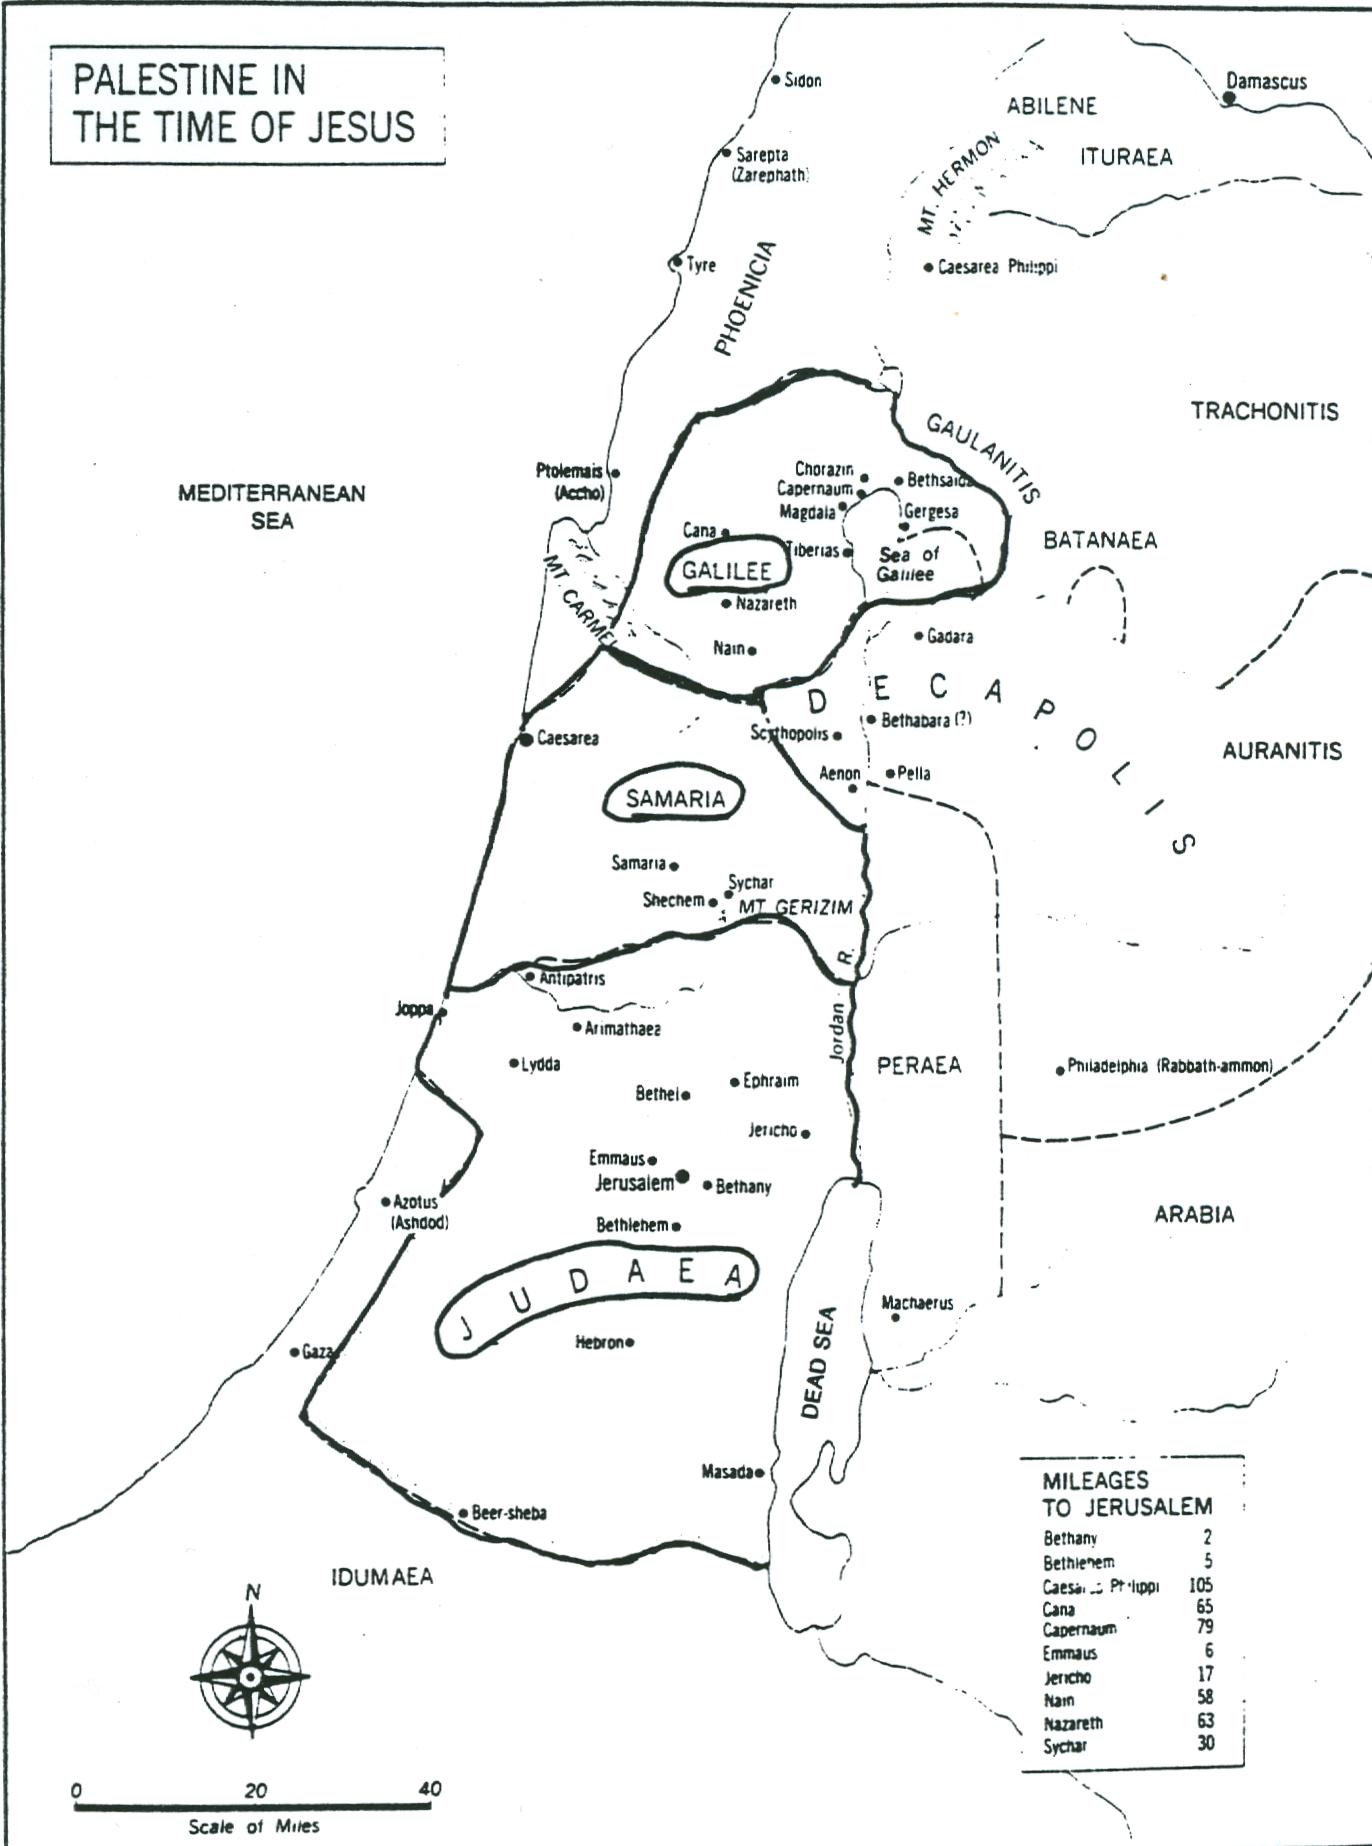 Maps.Palestine